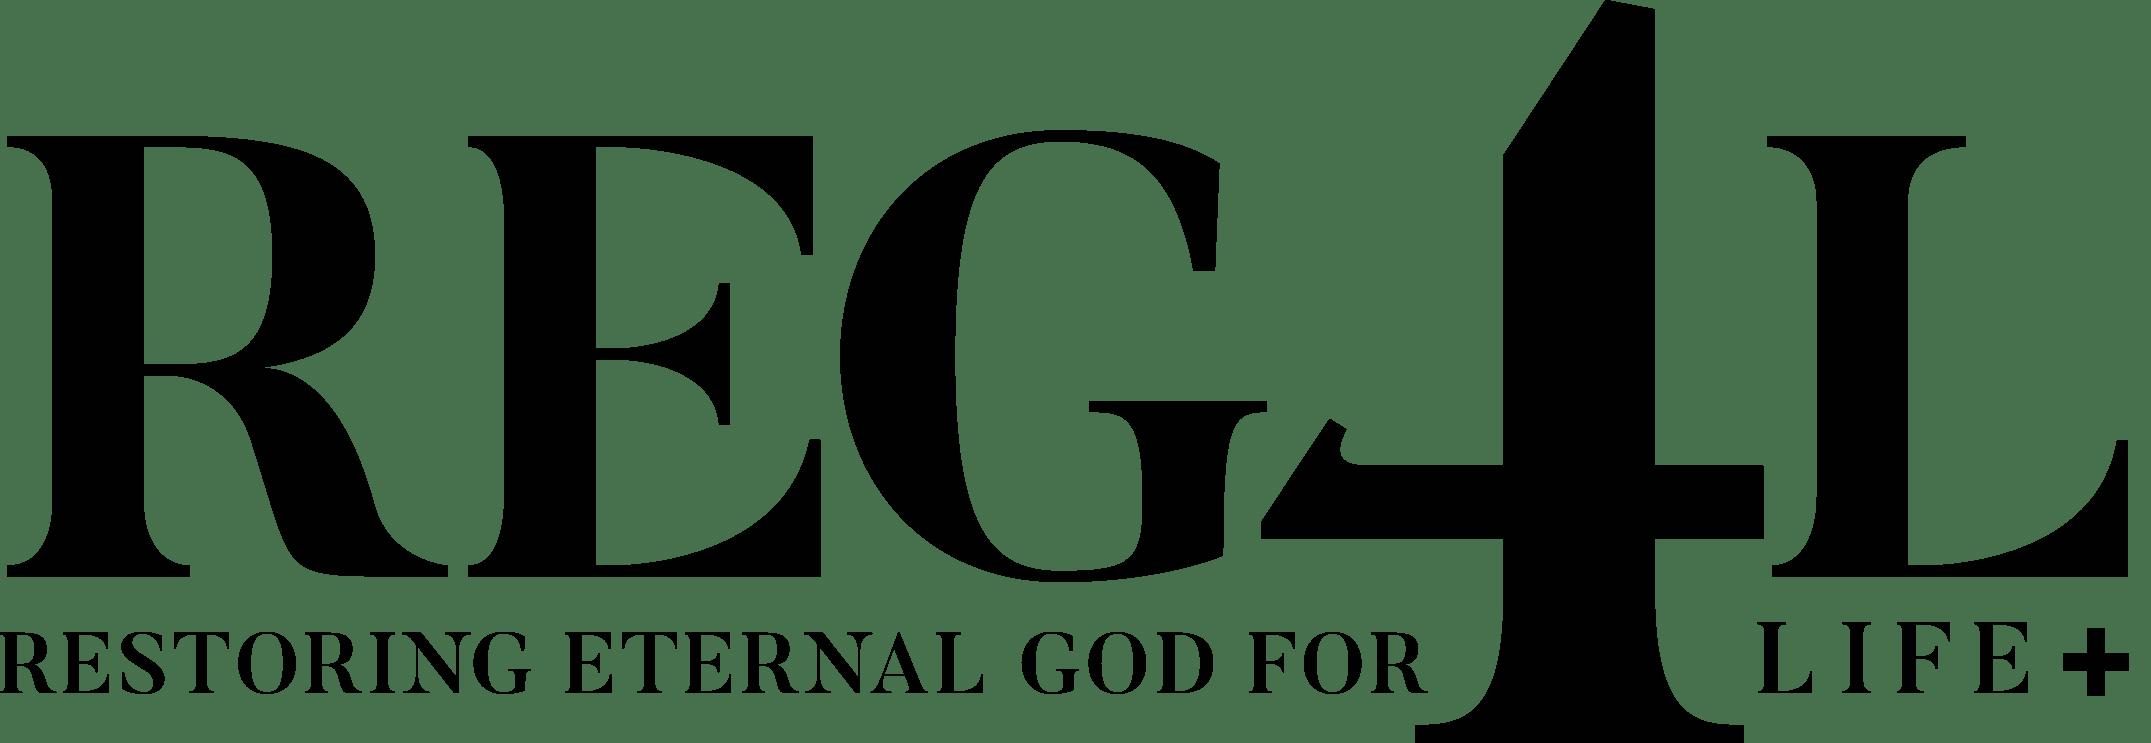 Reg4l Food and Life Essential Program